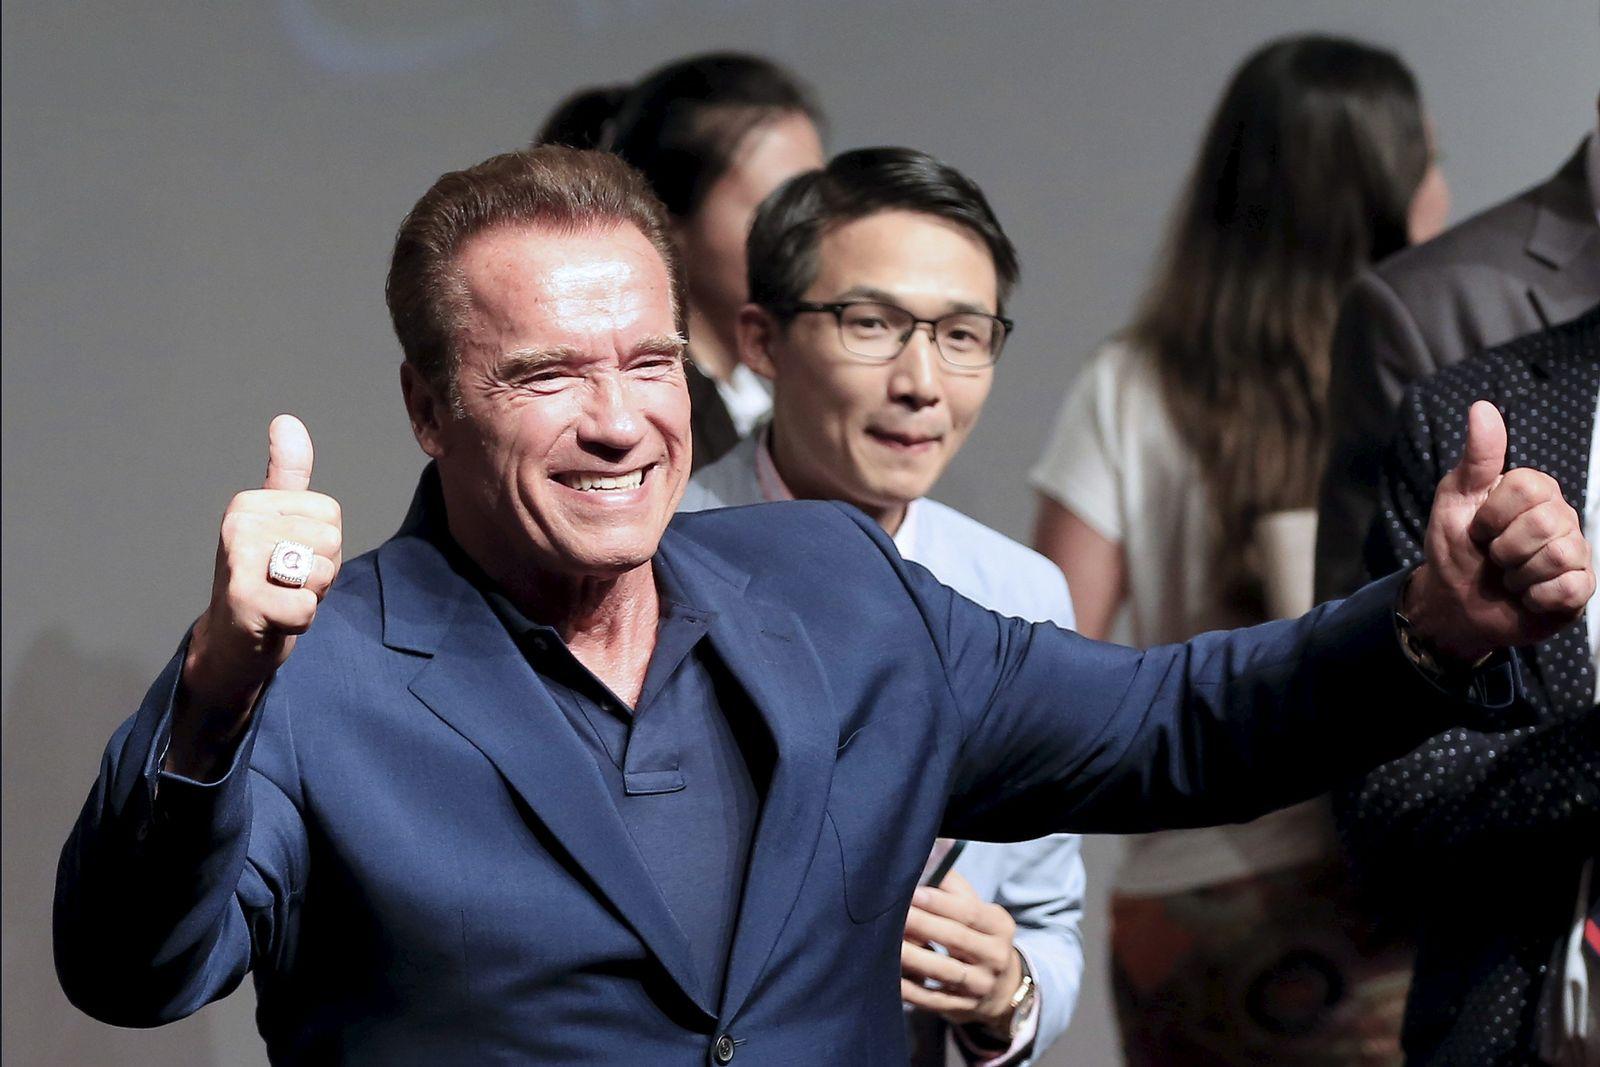 Schwarzenegger NBC-CELEBRITY APPRENCTICE/